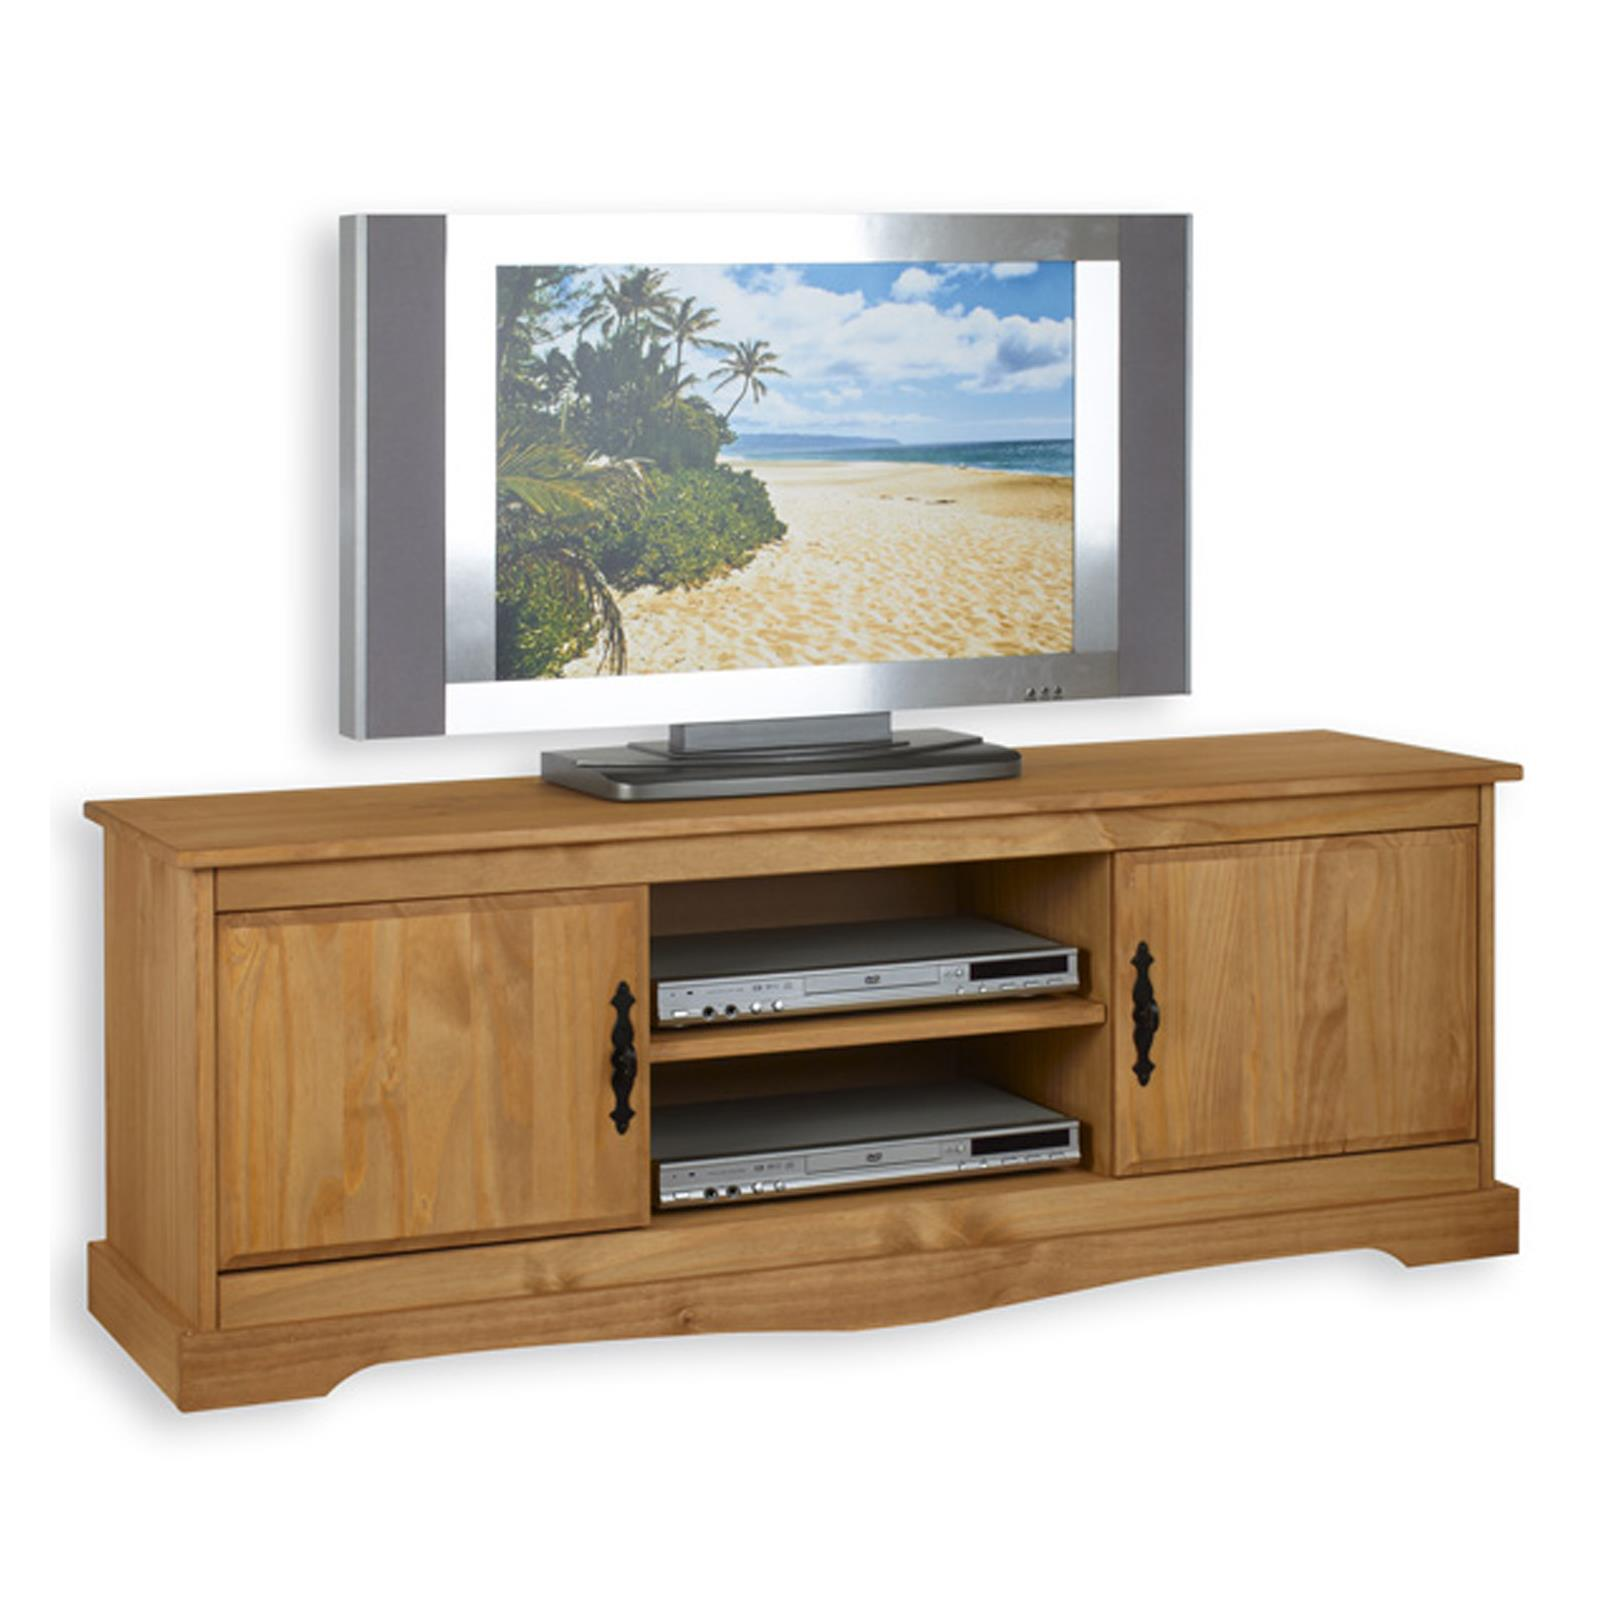 TV Lowboard Kiefer massiv 135 cm breit Rack Phono Medien Möbel ...